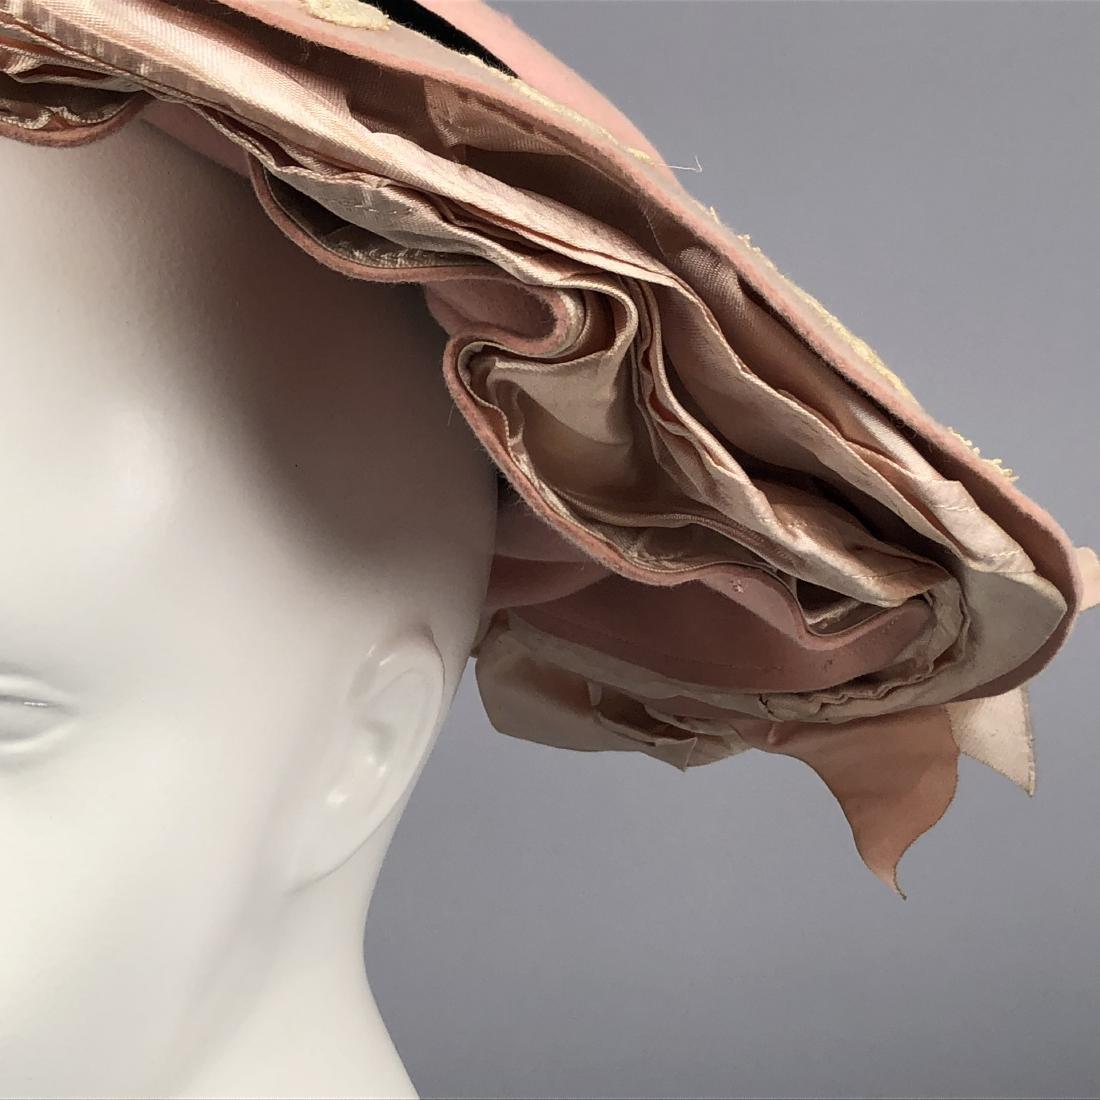 THREE WIDE-BRIM HATS, 1902 - 1910 - 4